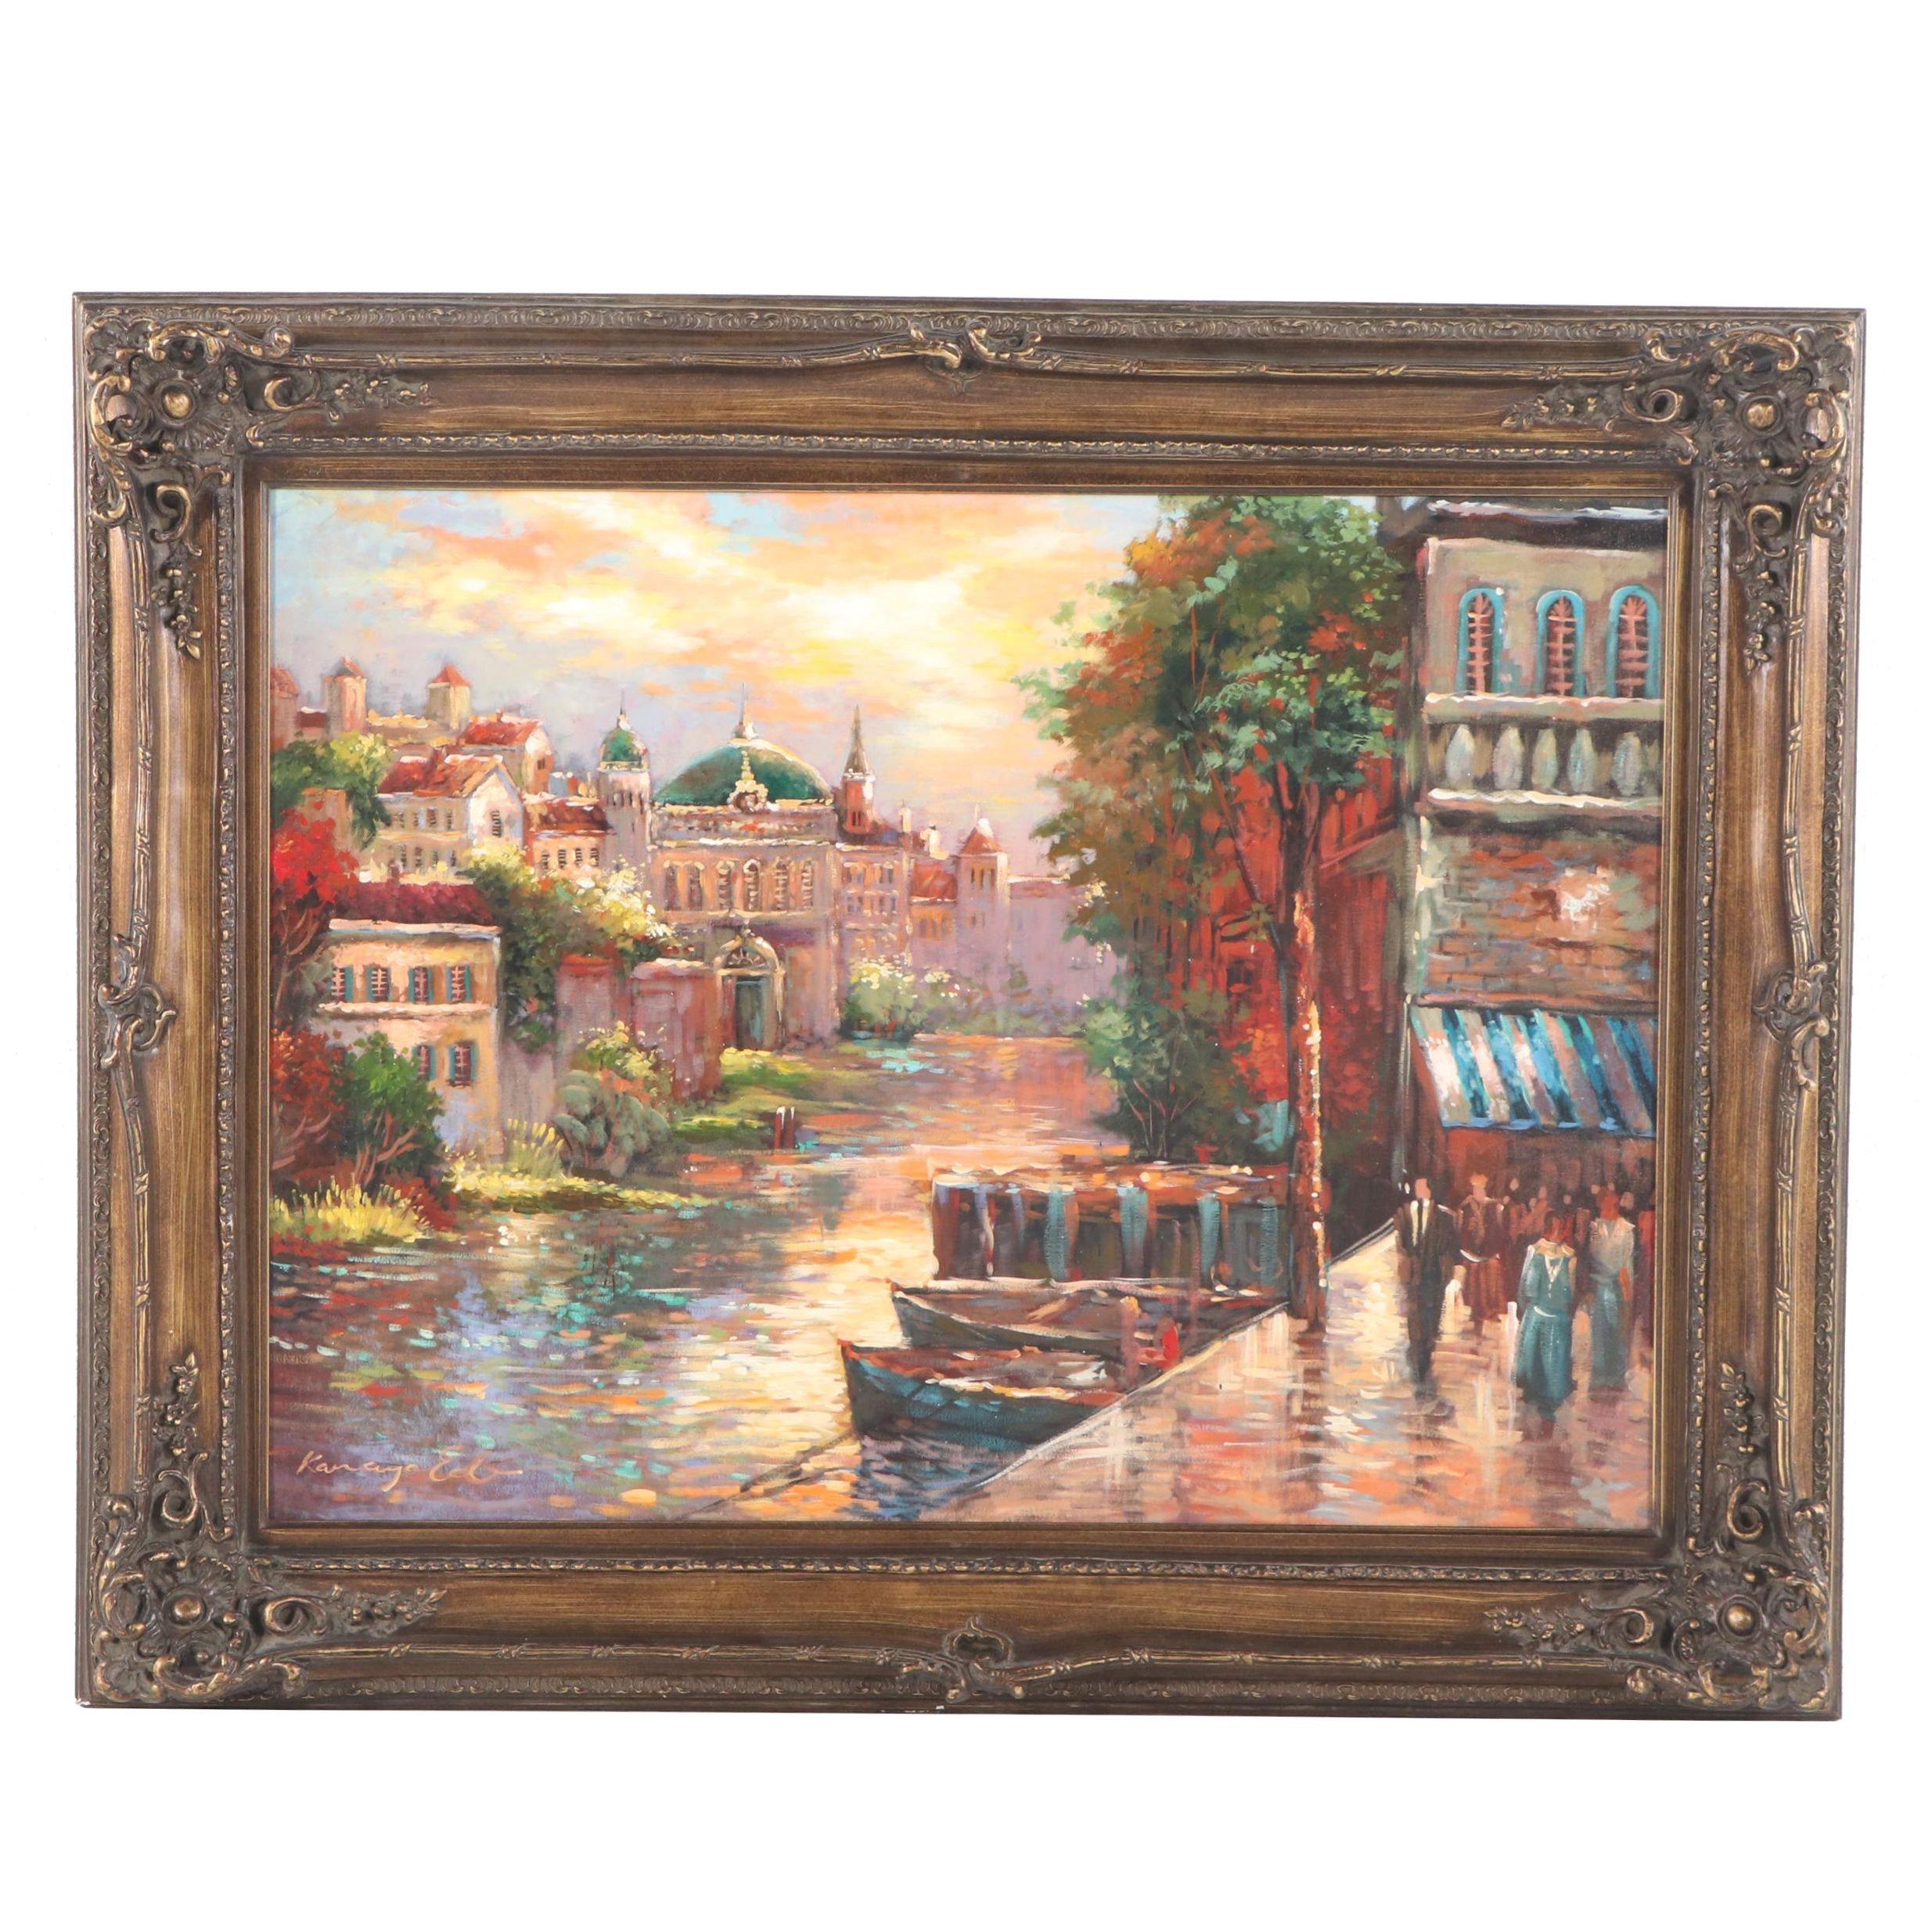 Embellished Giclée of a Canal Landscape